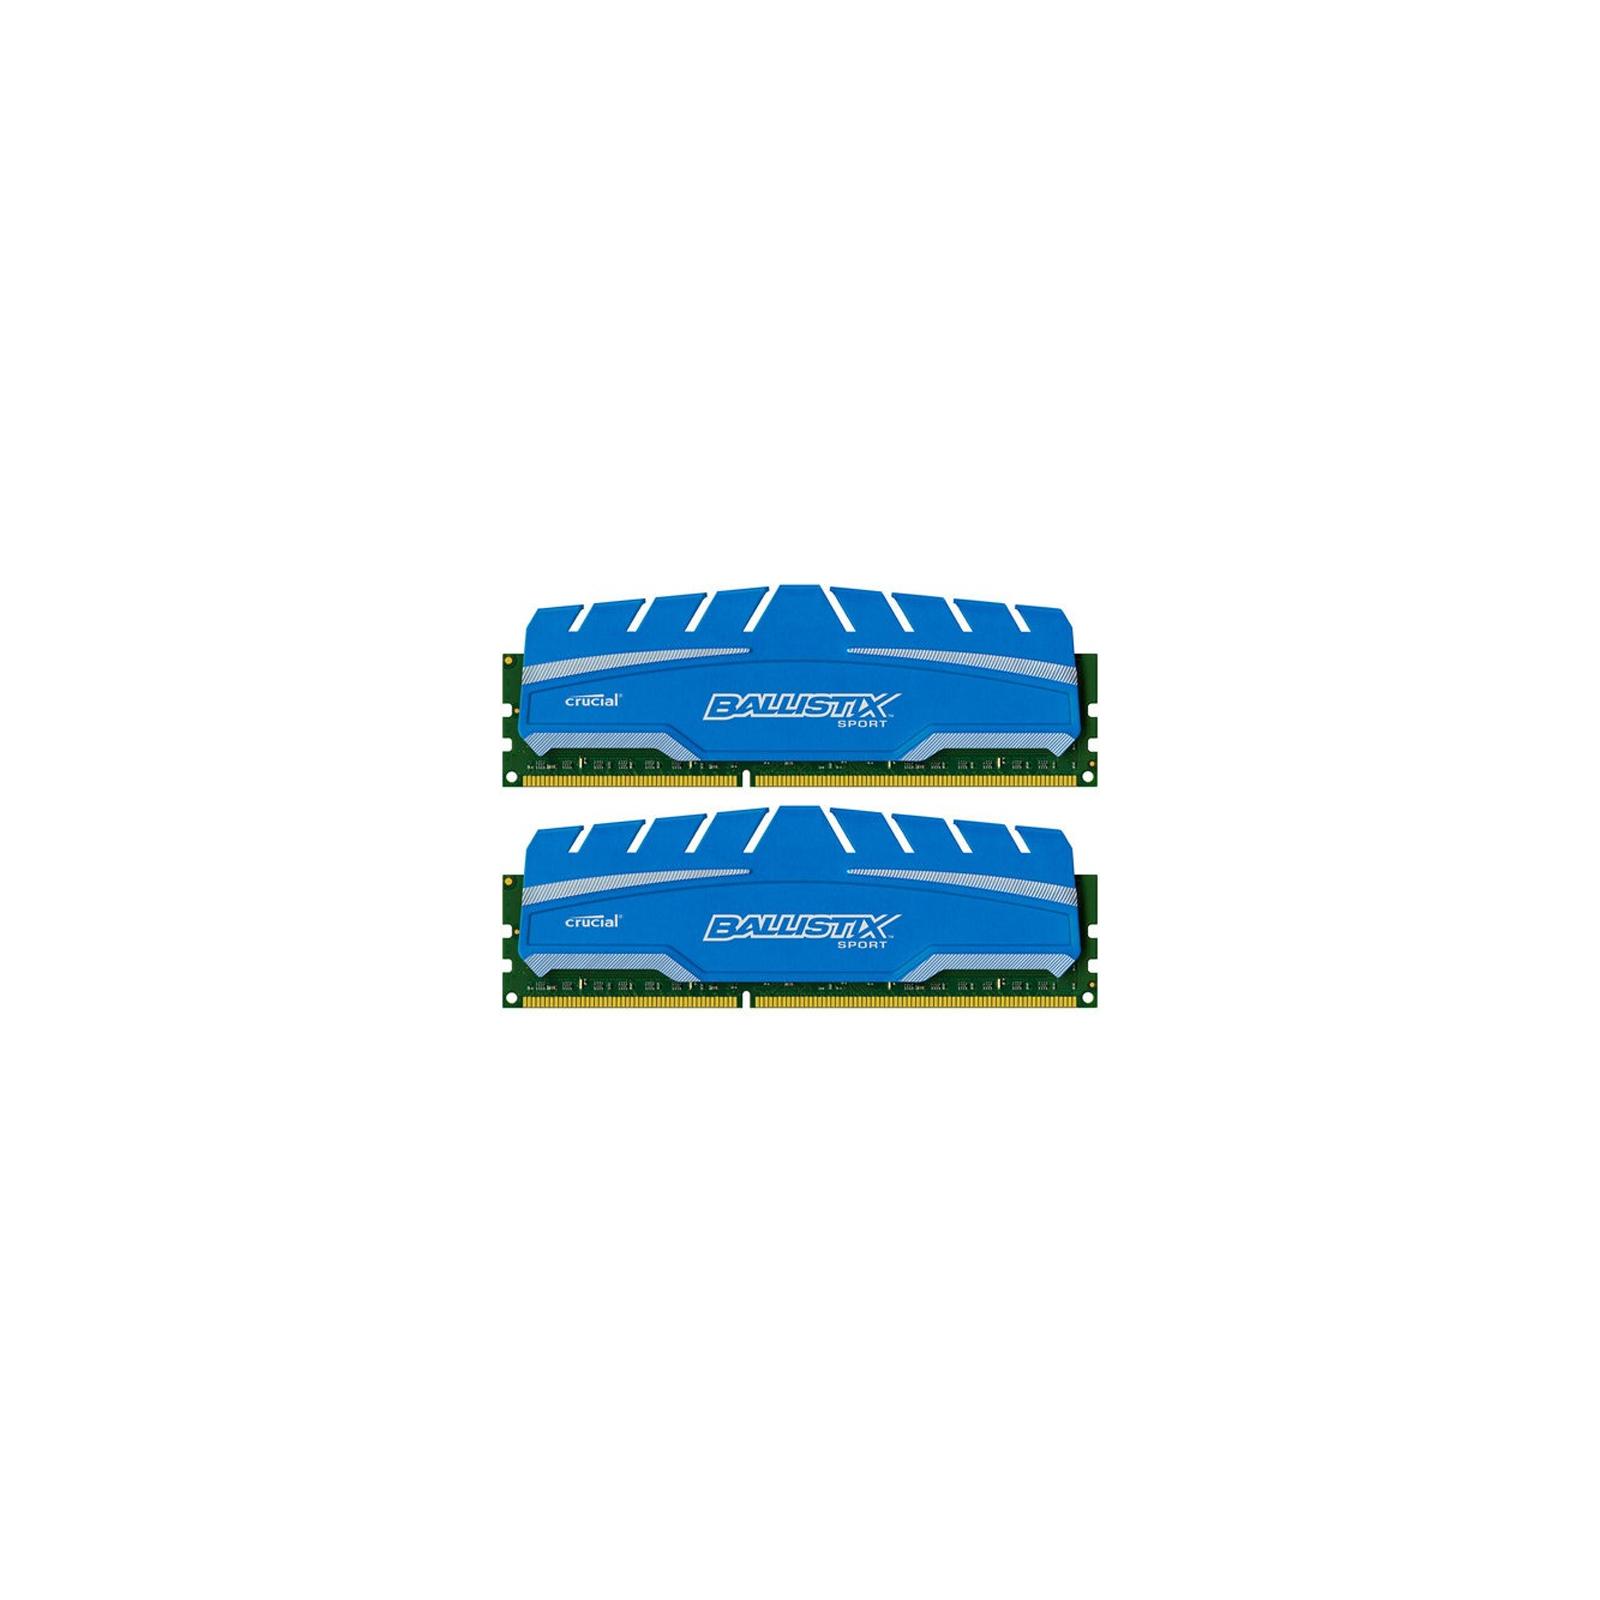 Модуль памяти для компьютера DDR3 16GB (2x8GB) 1600 MHz Ballistix Sport XT MICRON (BLS2C8G3D169DS3CEU)